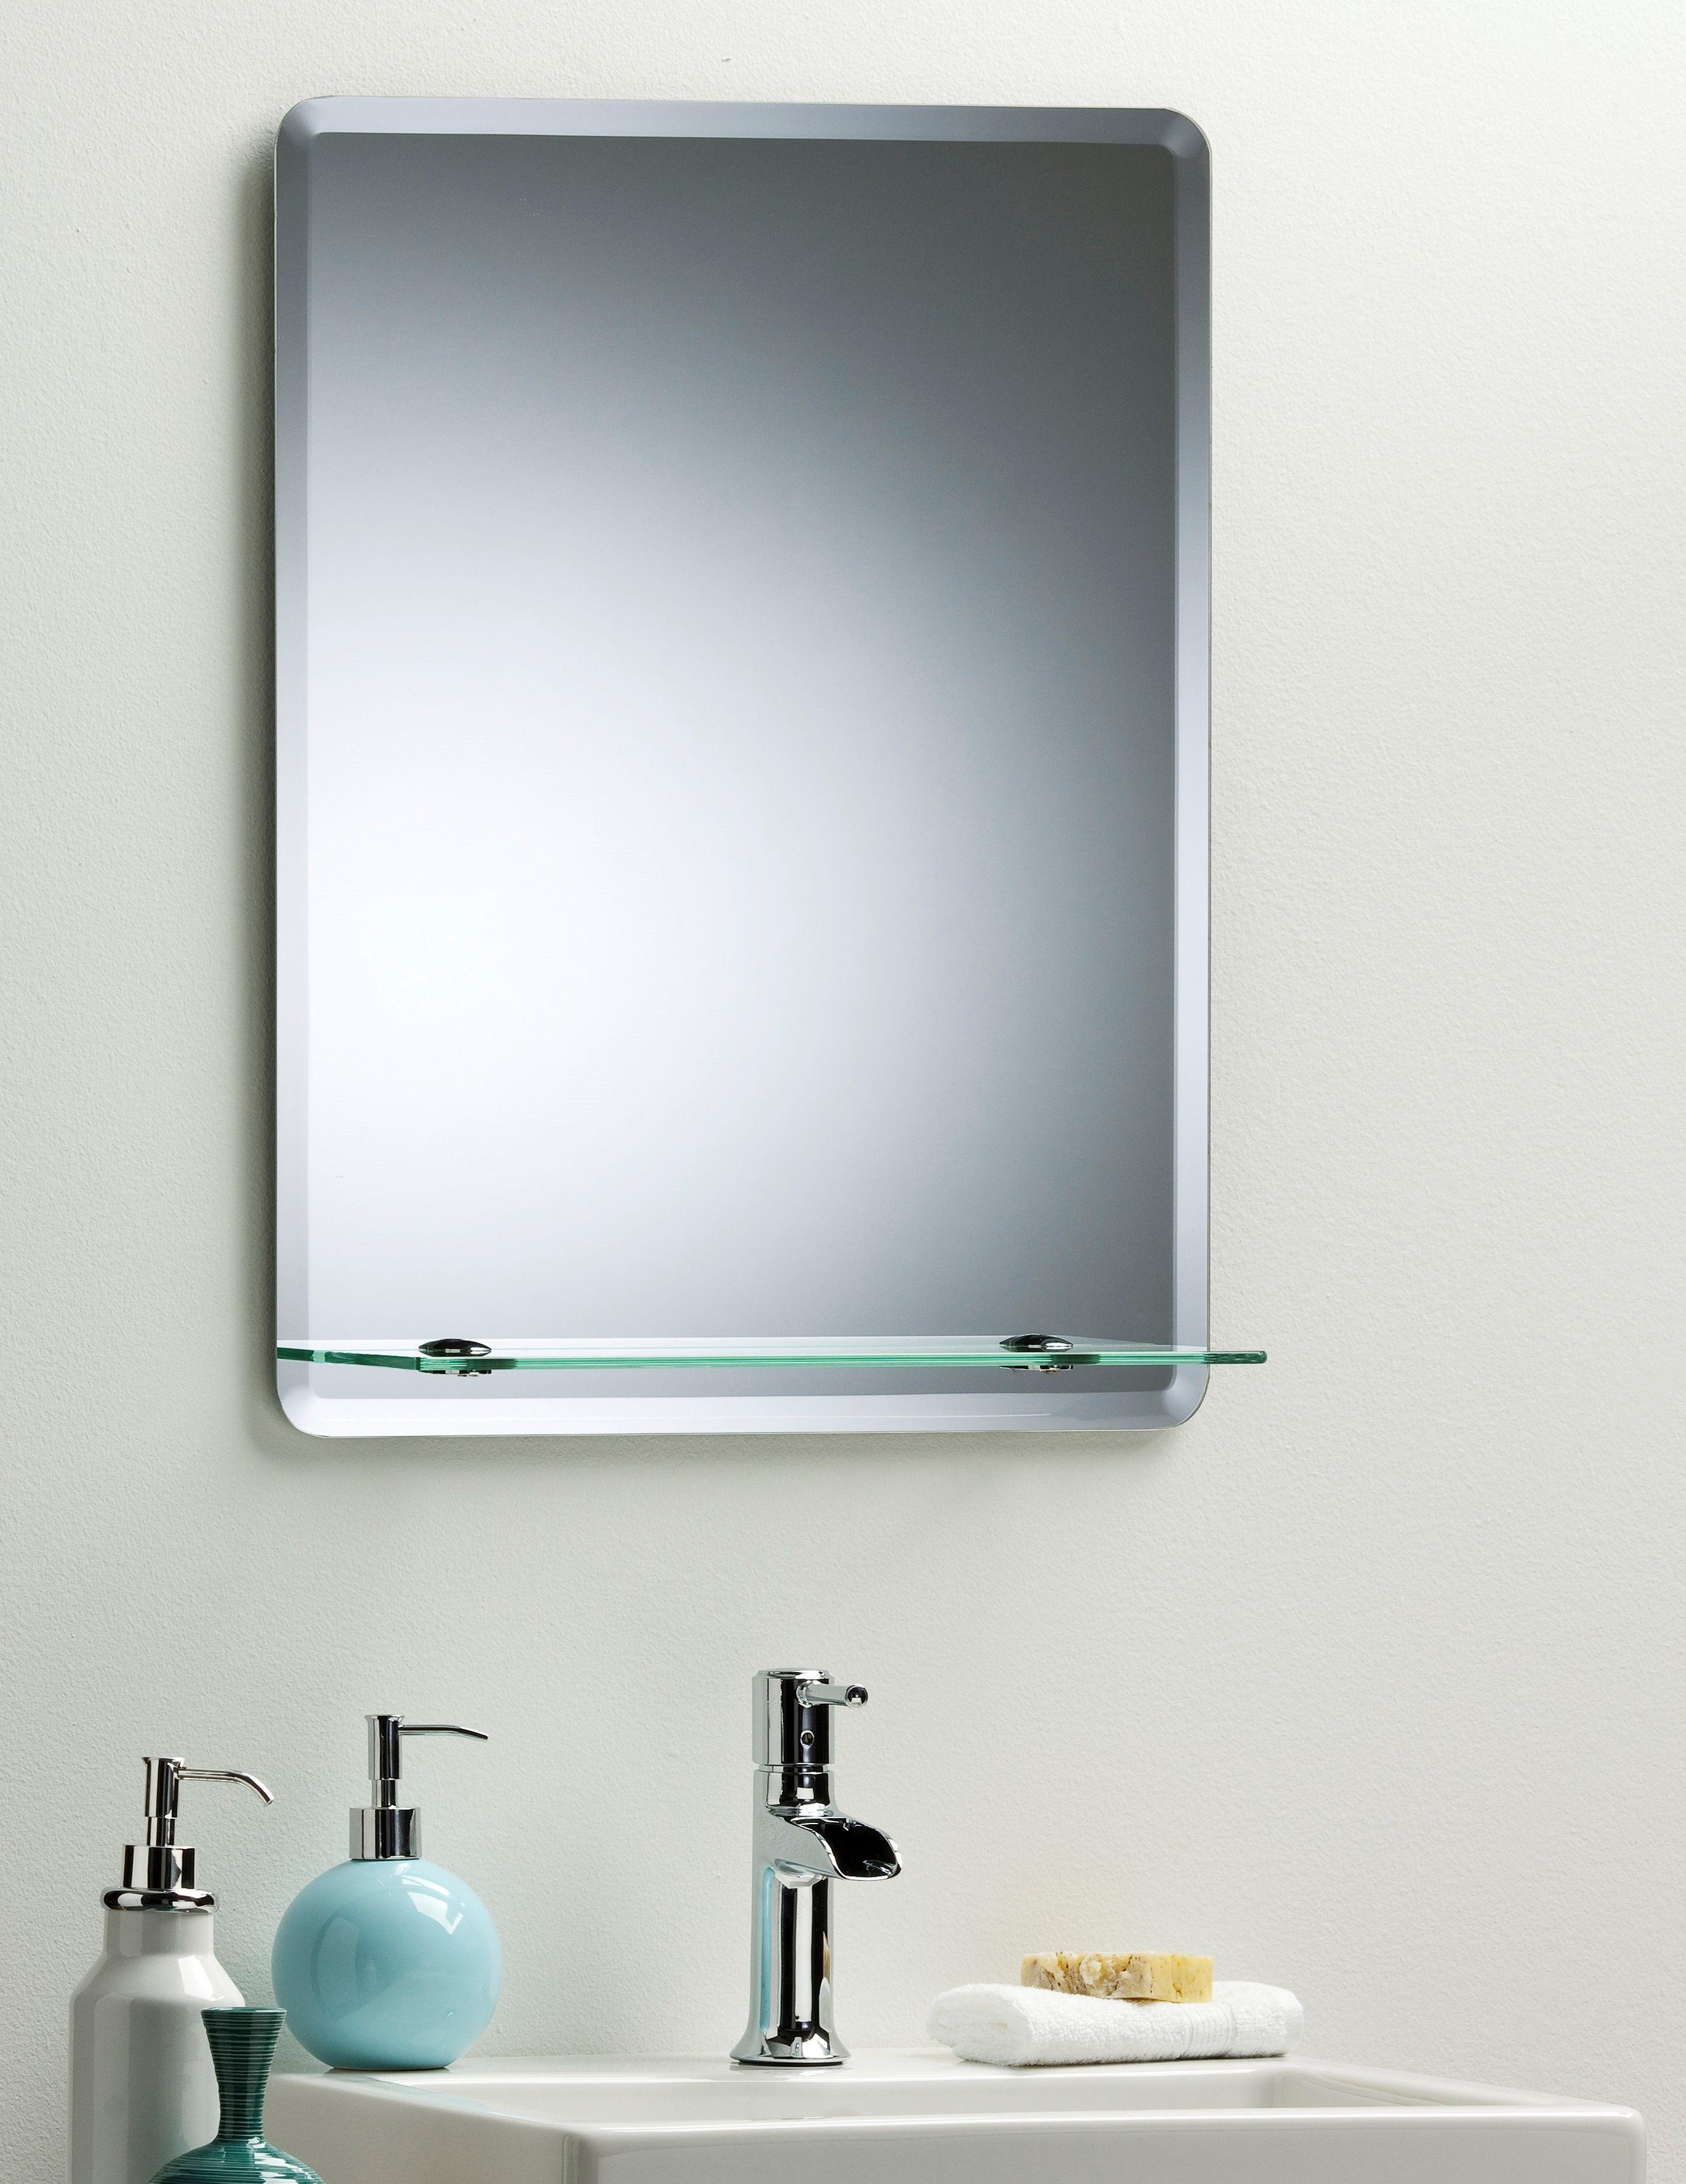 Badezimmer Spiegel Ideen Moderne Badezimmerspiegel Badspiegel Mit Regal Badezimmerspiegel